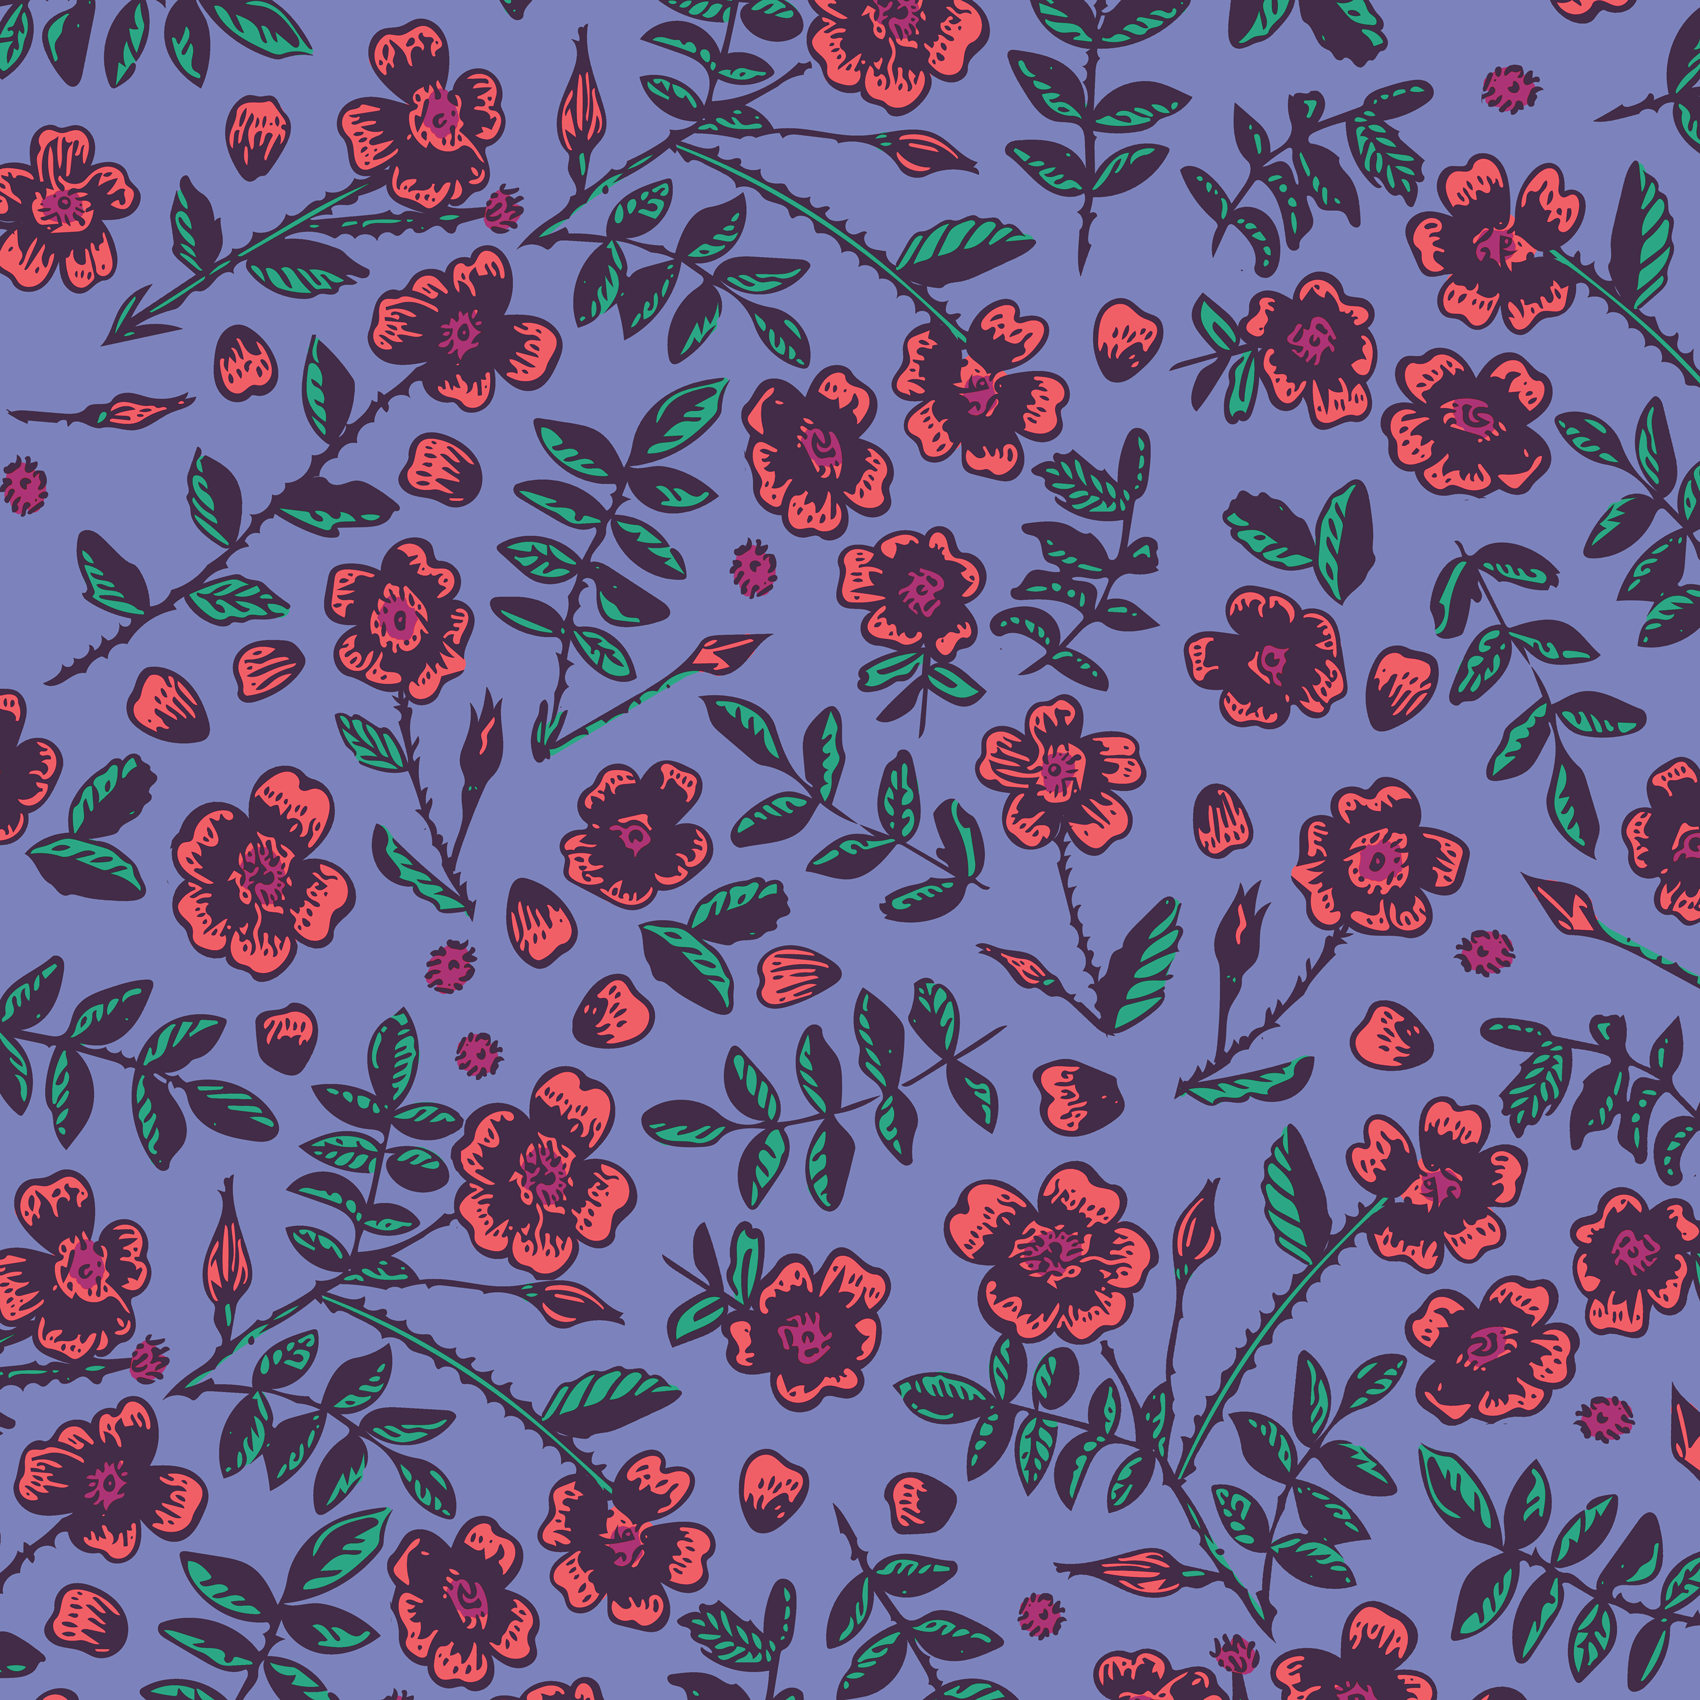 floral10.png